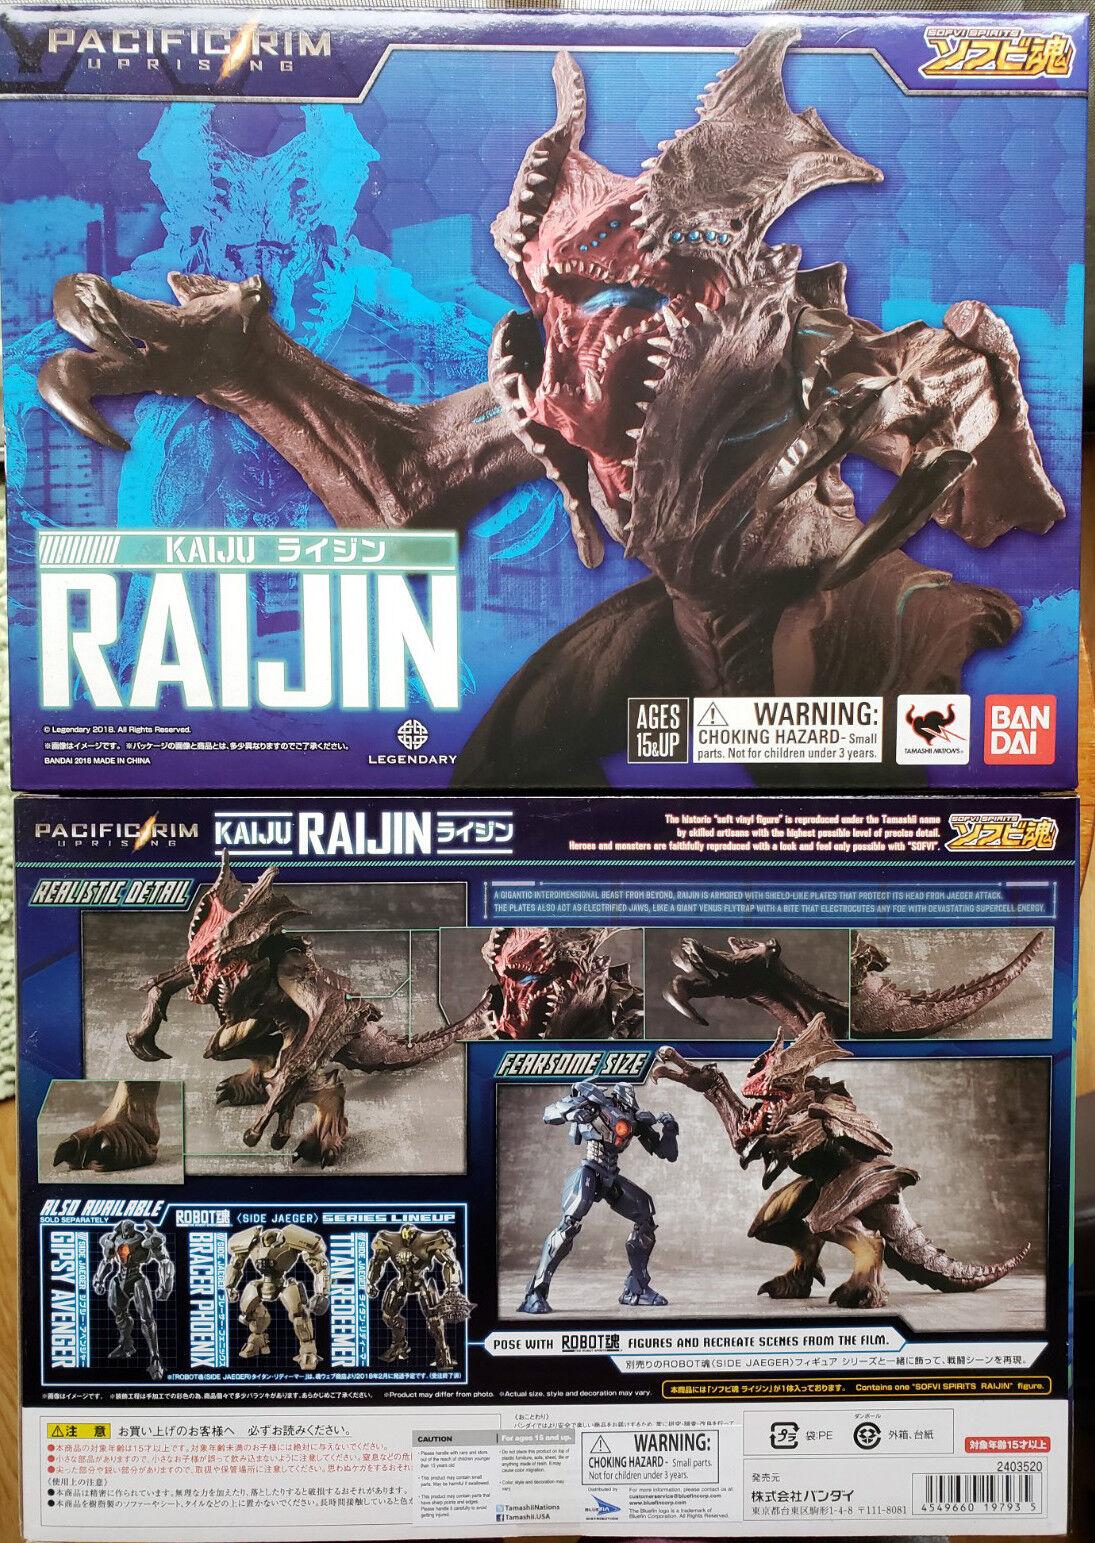 US US US Ship Pacific Rim 2 Uprising Sofvi Spirits Raijin 8  Action Figure Collectible 044c14